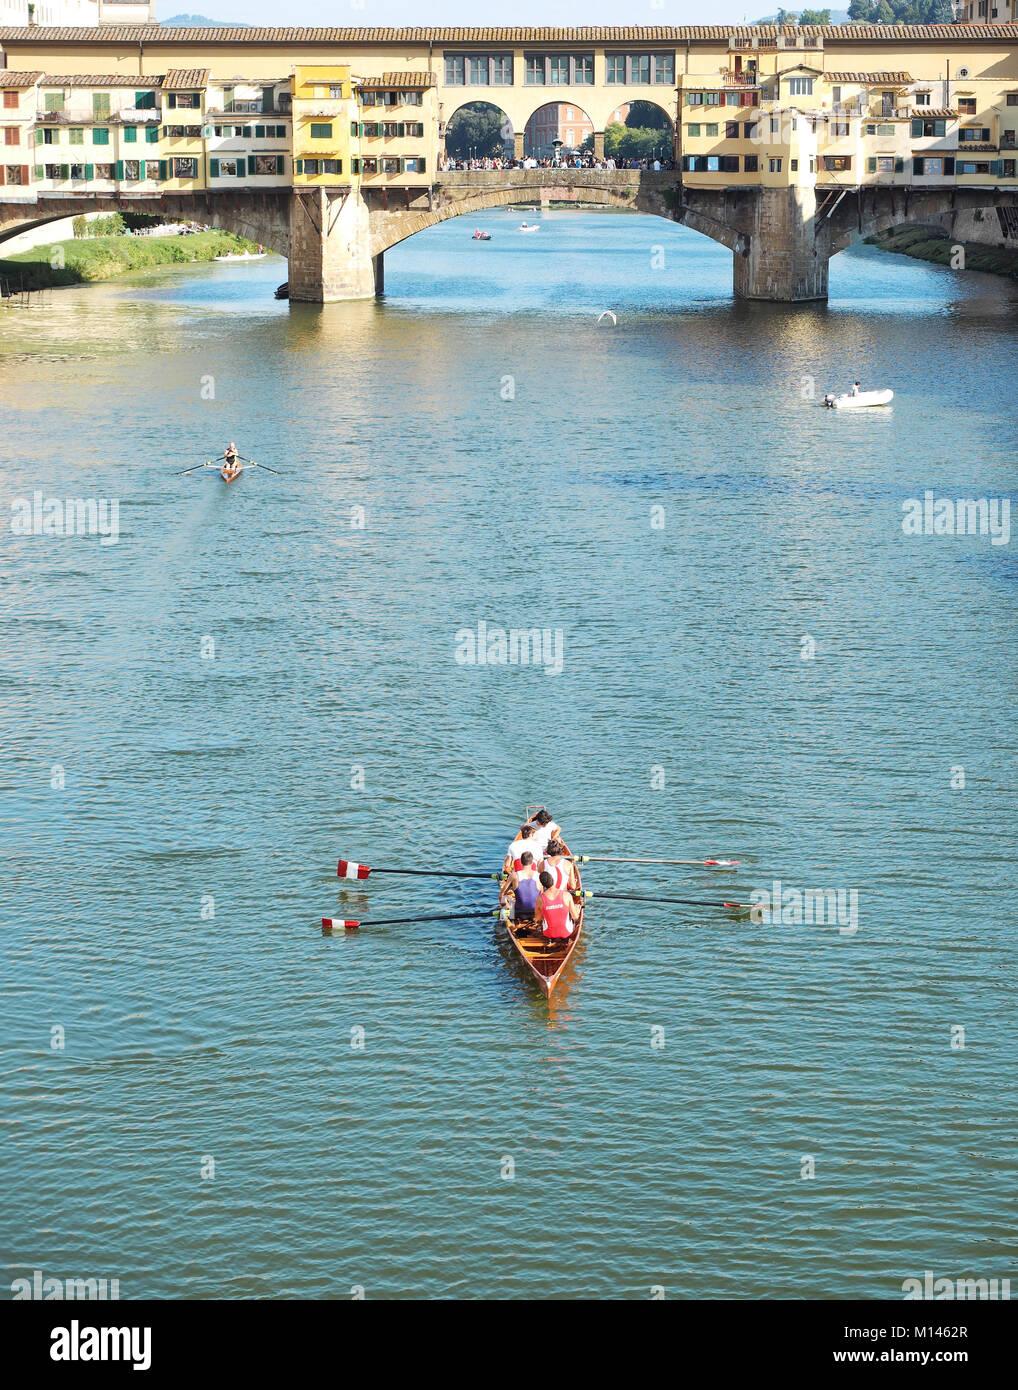 Europe,Italy,Tuscany,Florence,canoe by the Ponte Vecchio - Stock Image